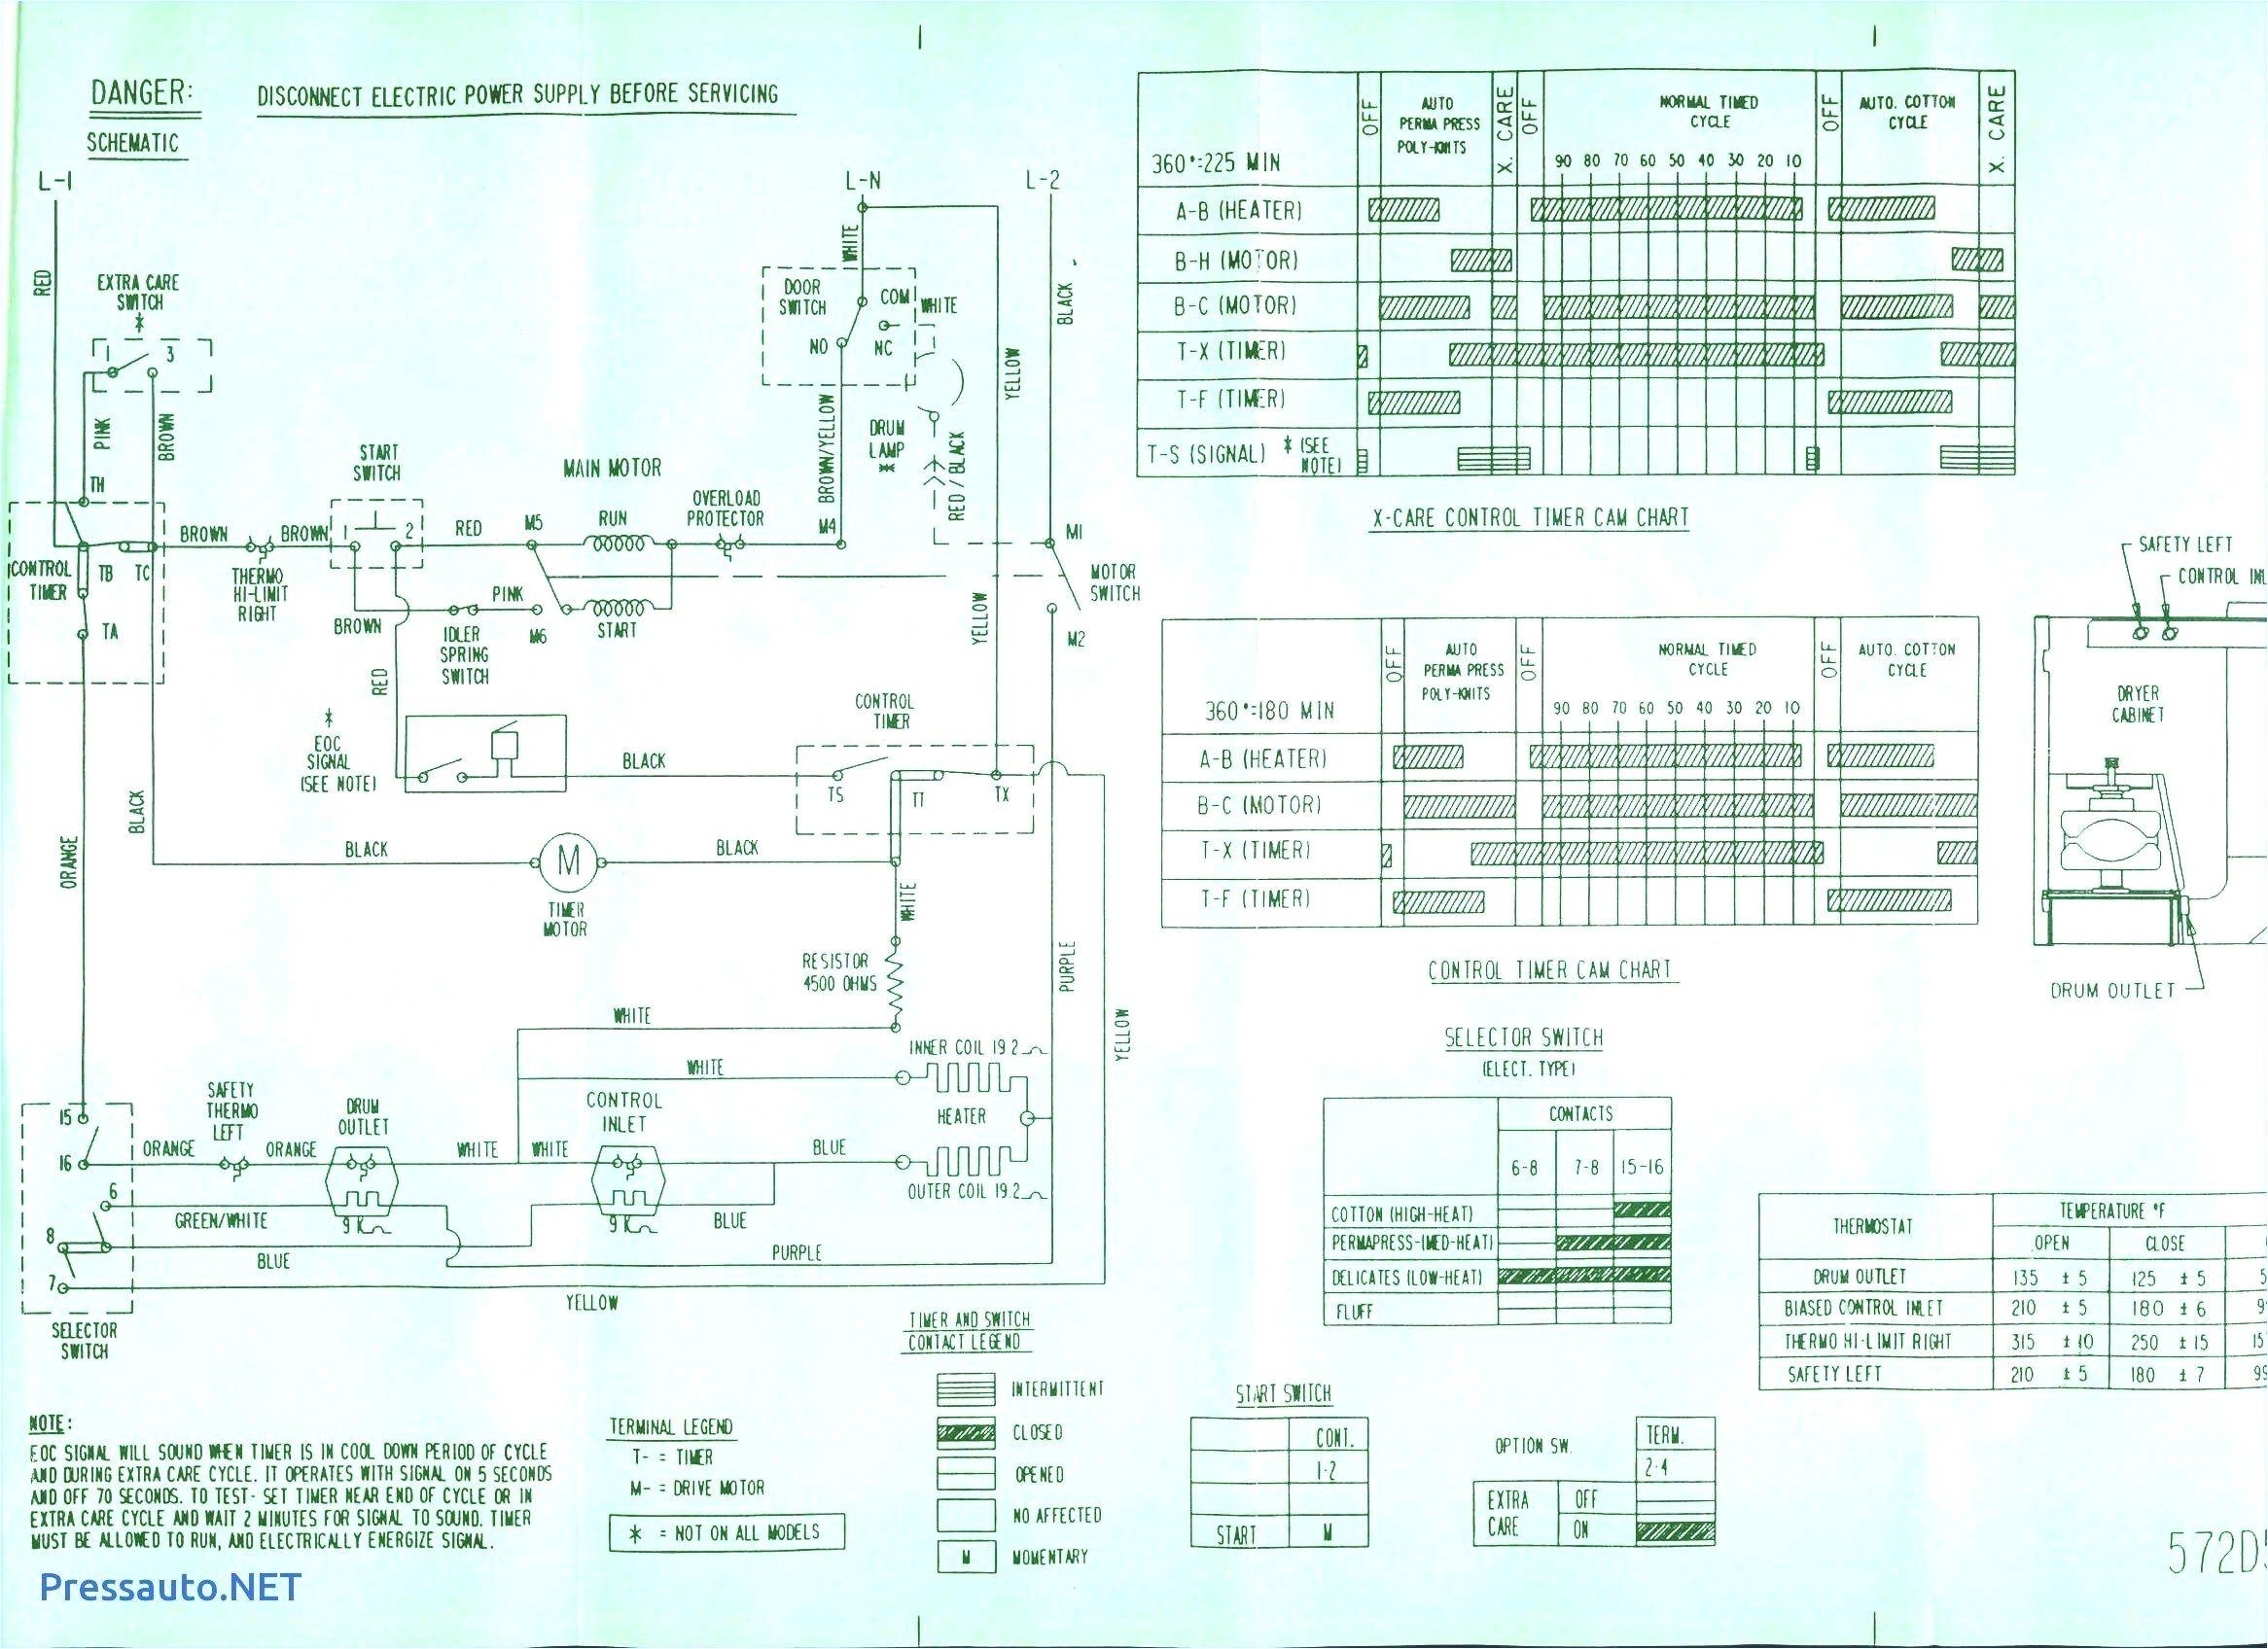 ge stove wiring diagram motor refrigerator dryer timer problem top pertaining to nice ge stove wiring